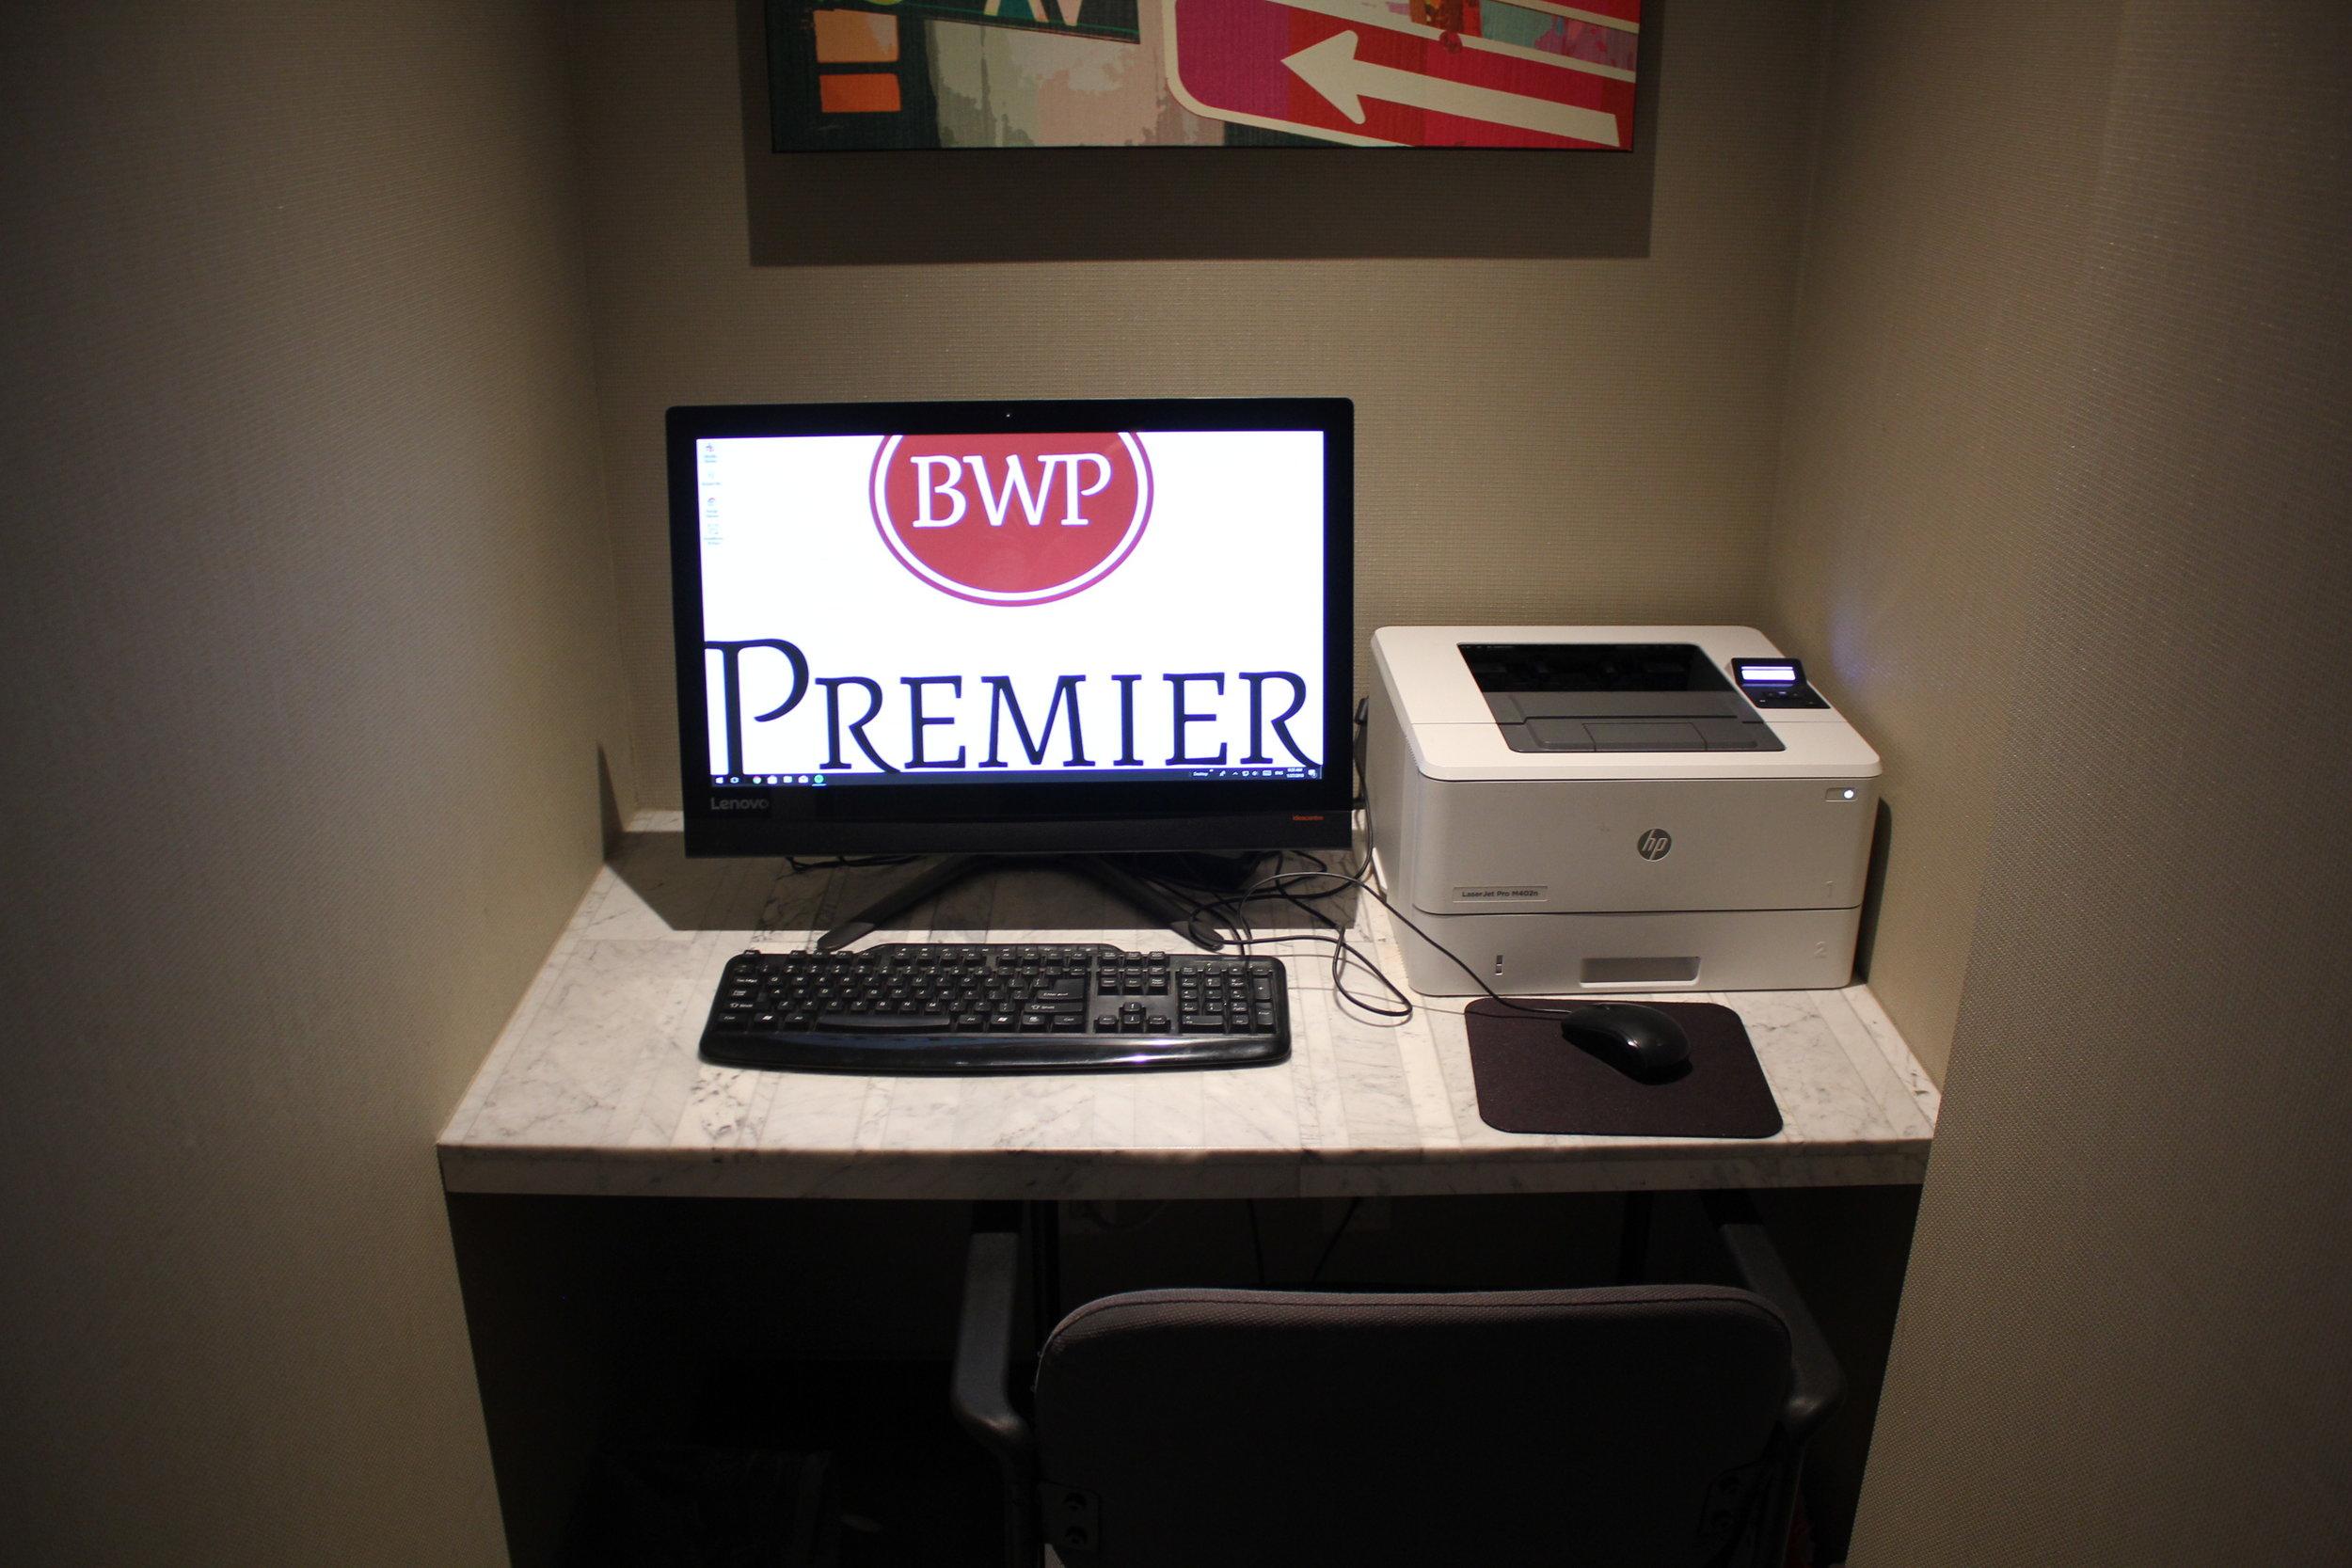 Best Western Premier New York Herald Square – Computer workstation